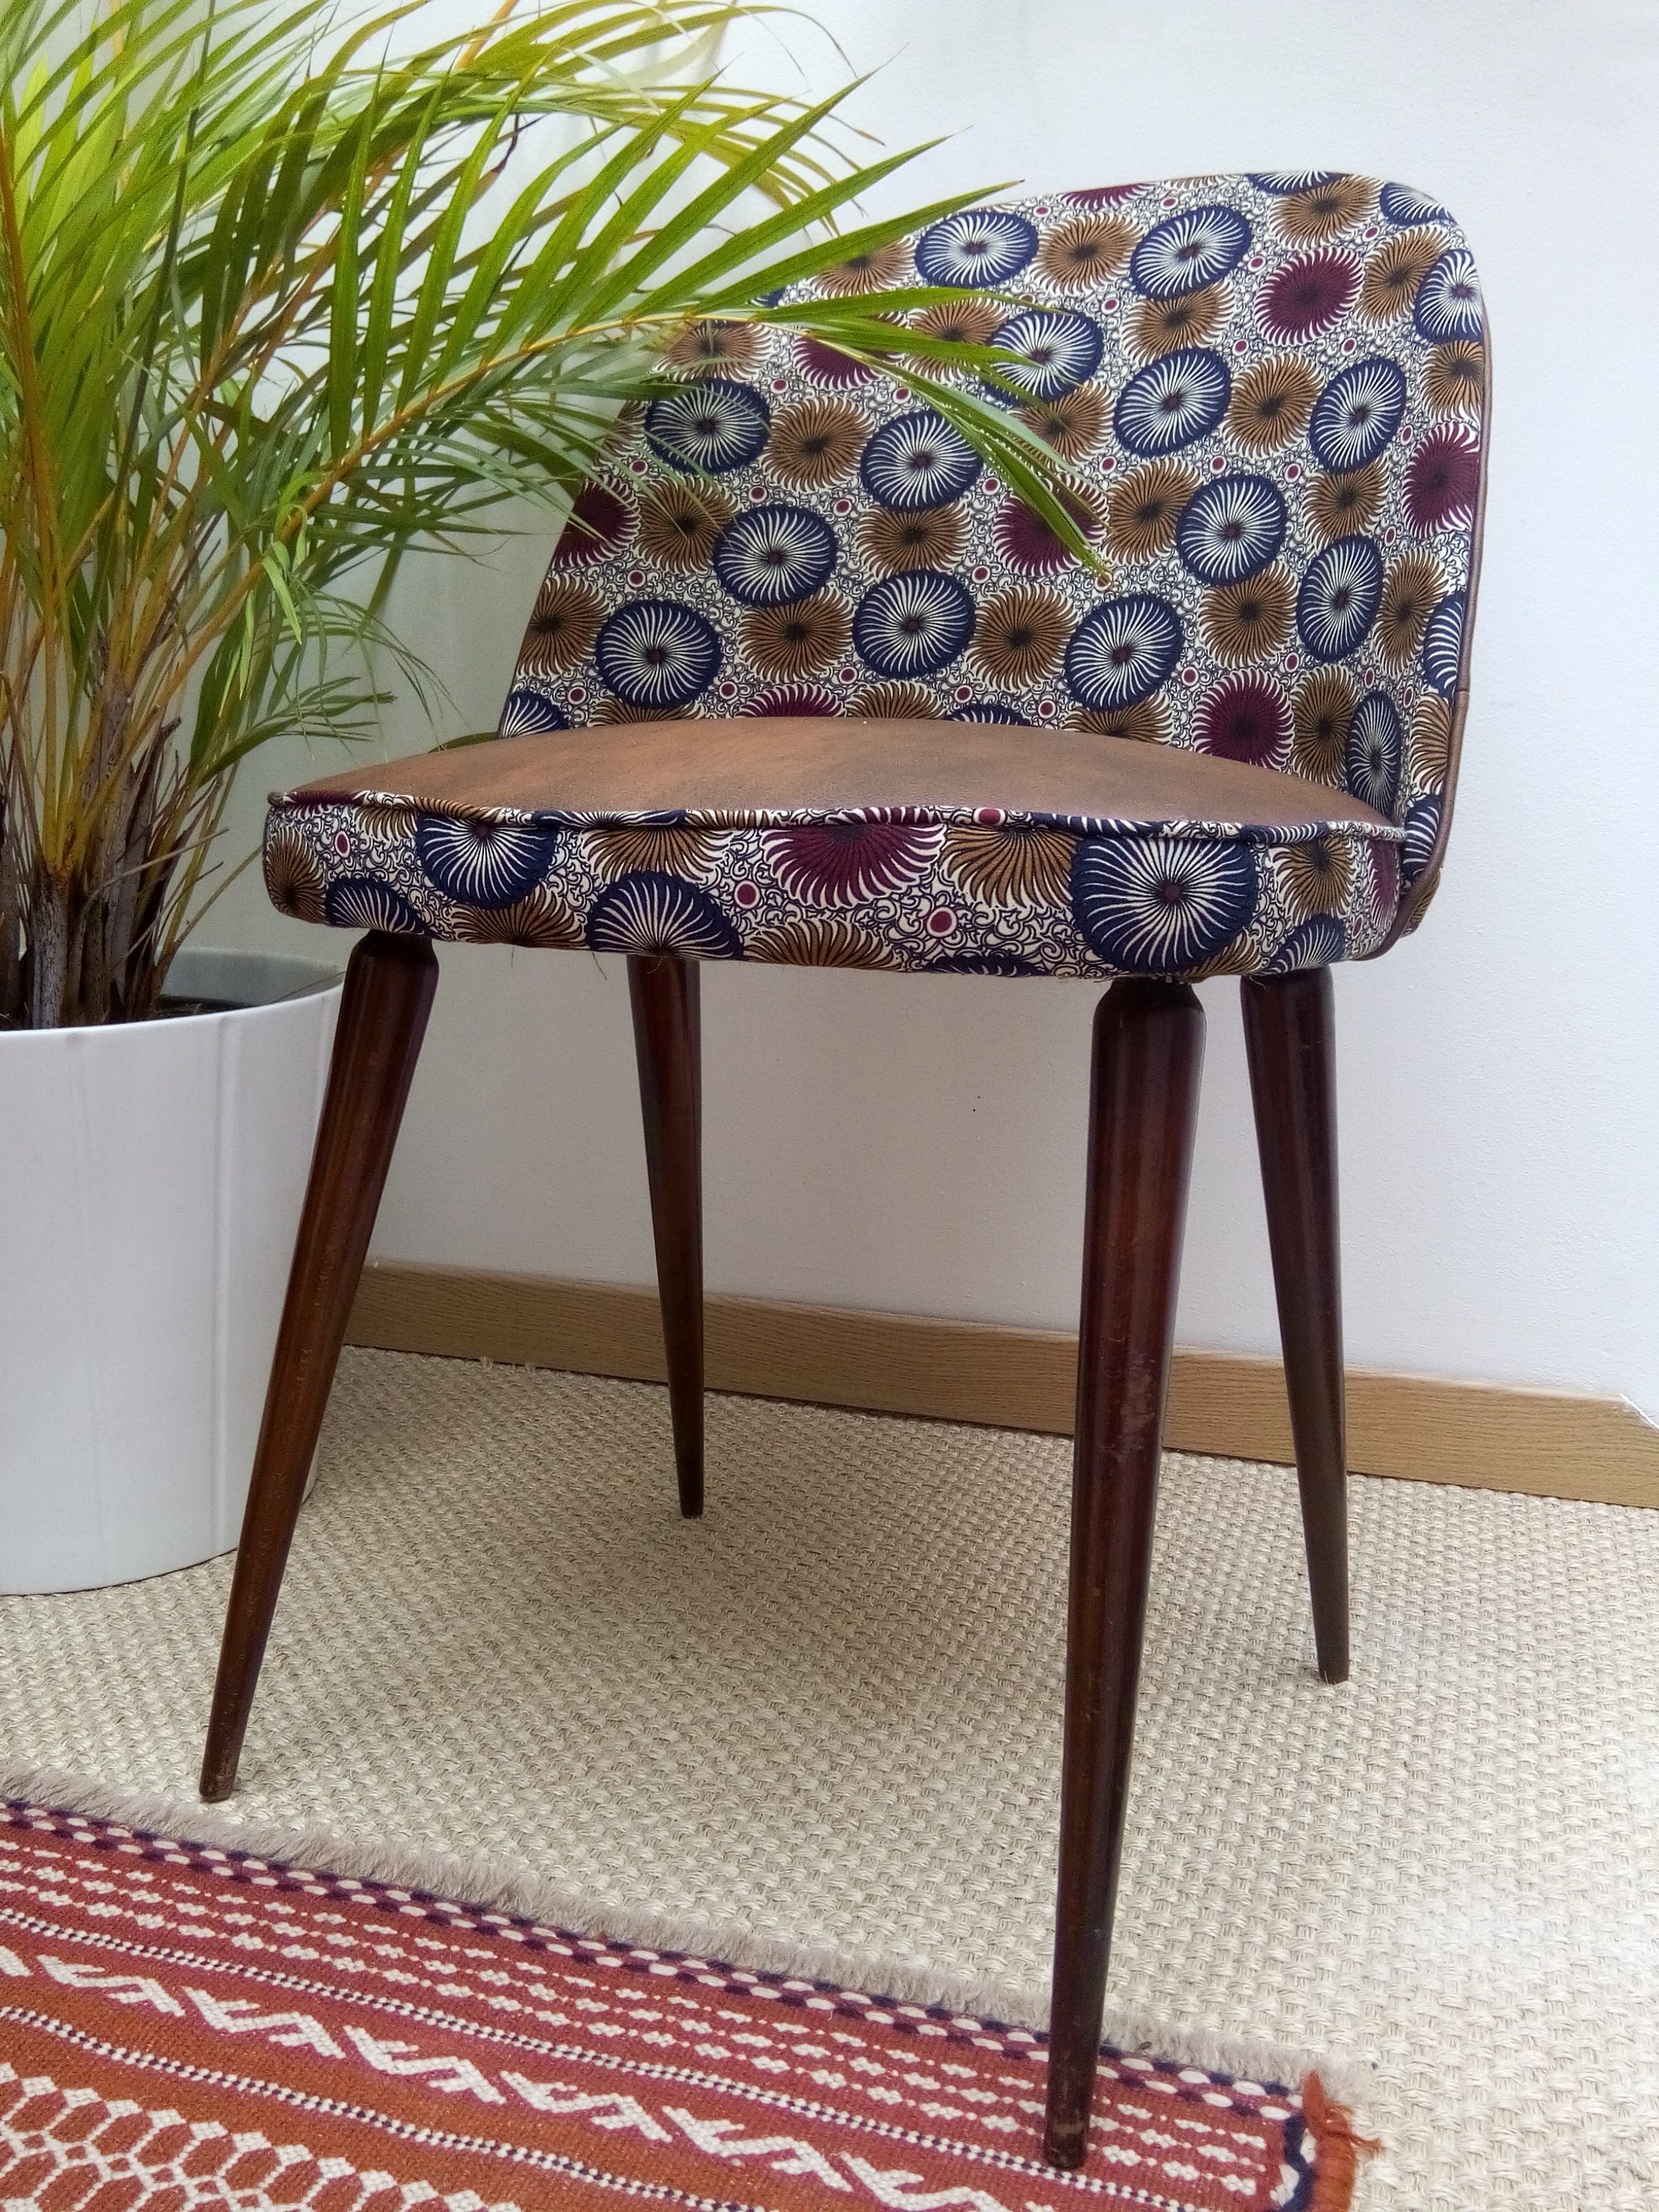 fauteuil retapisser atmolybom tissu ouzb kistan at moly b m tapisserie d 39 ameublement. Black Bedroom Furniture Sets. Home Design Ideas